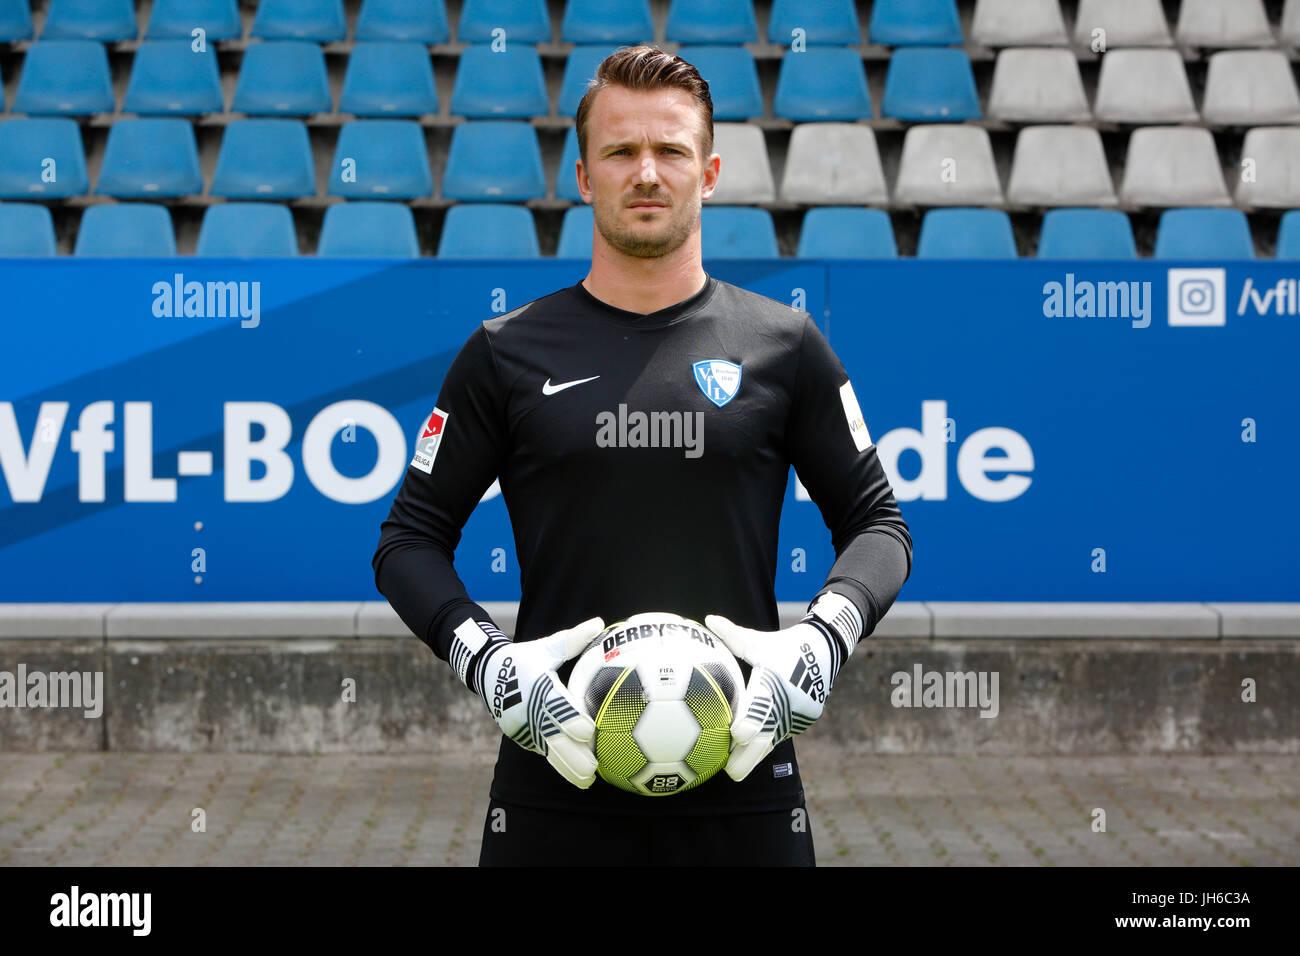 football, 2. Bundesliga, 2017/2018, VfL Bochum, team presentation for the game season, keeper Manuel Riemann - Stock Image